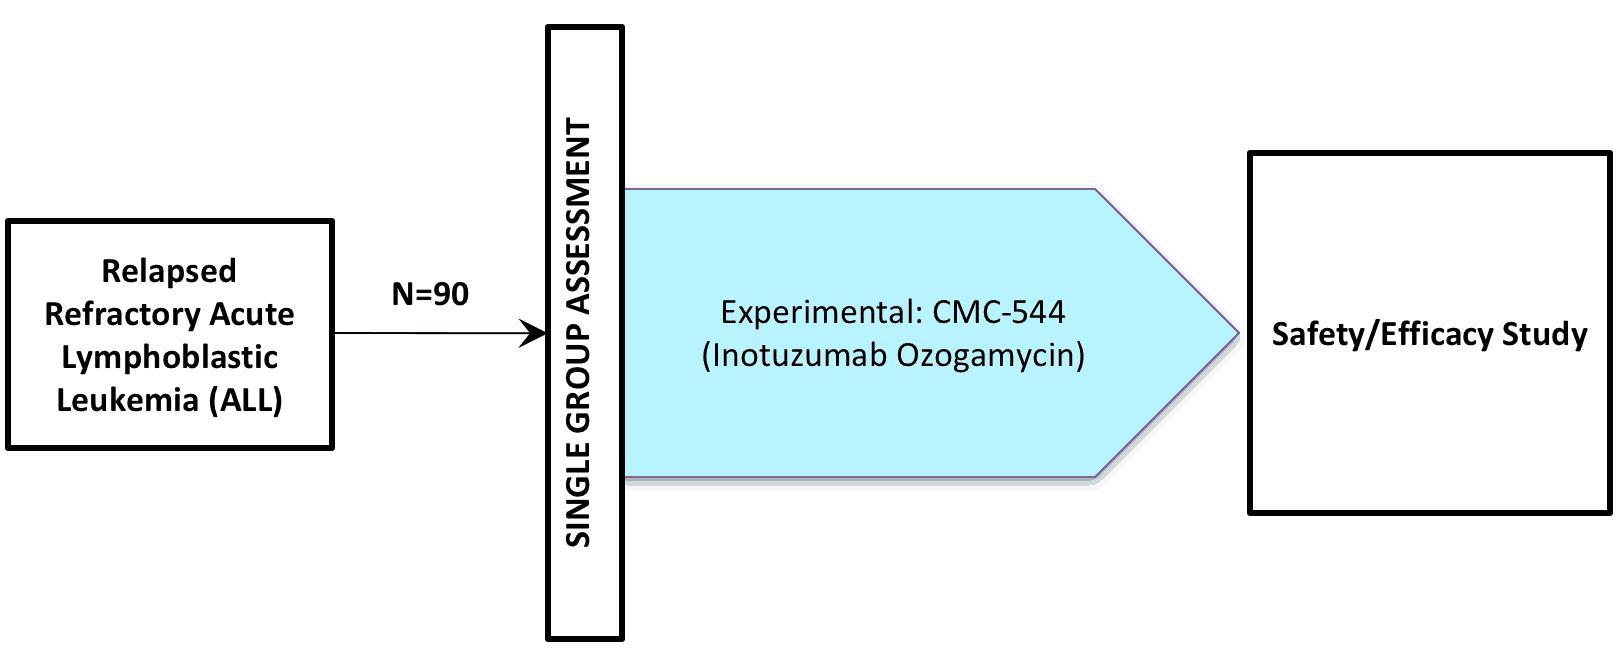 NCT01134575 (Clinical Trial / inotuzumab ozogamycin / CMC-544)